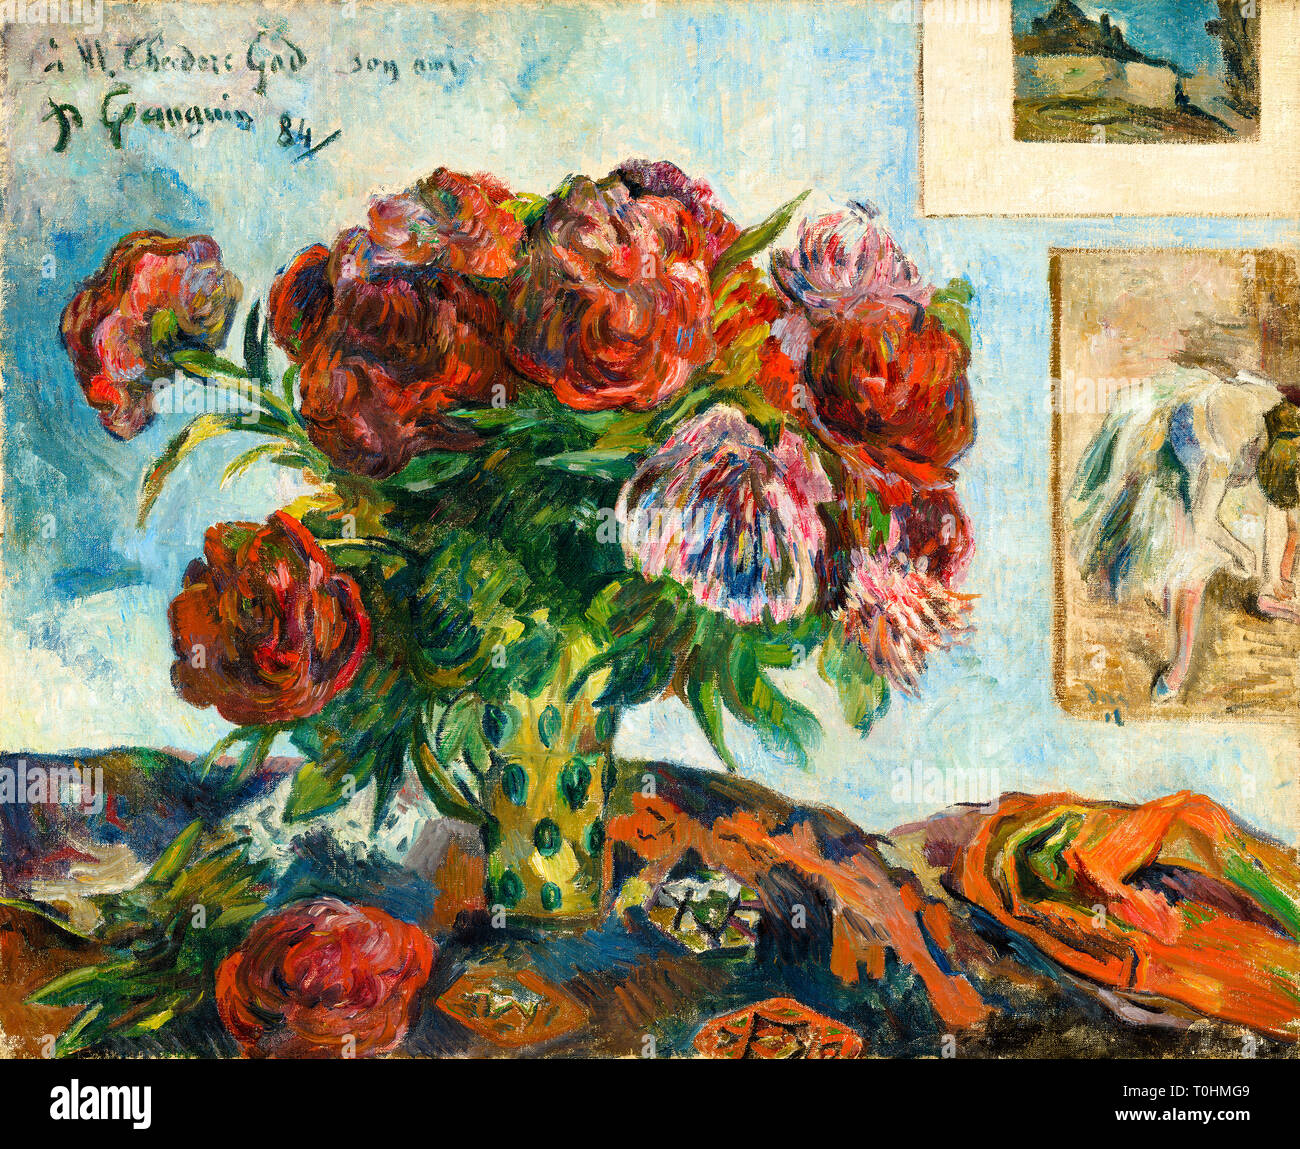 Paul Gauguin, Nature morte aux pivoines, peinture, 1884 Photo Stock